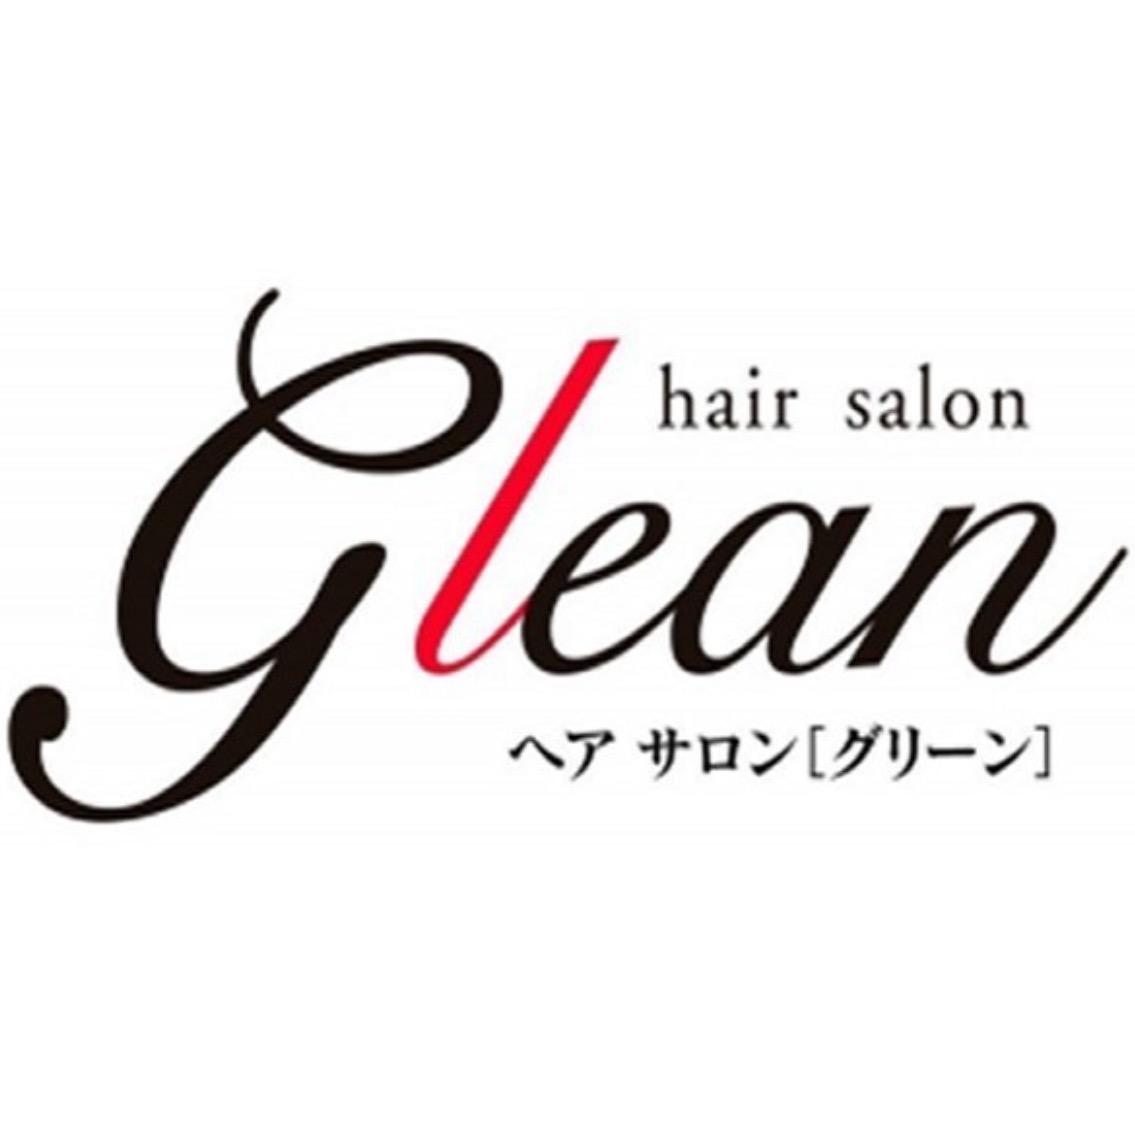 hair salon Glean【ヘアーサロングリーン 】 求人情報